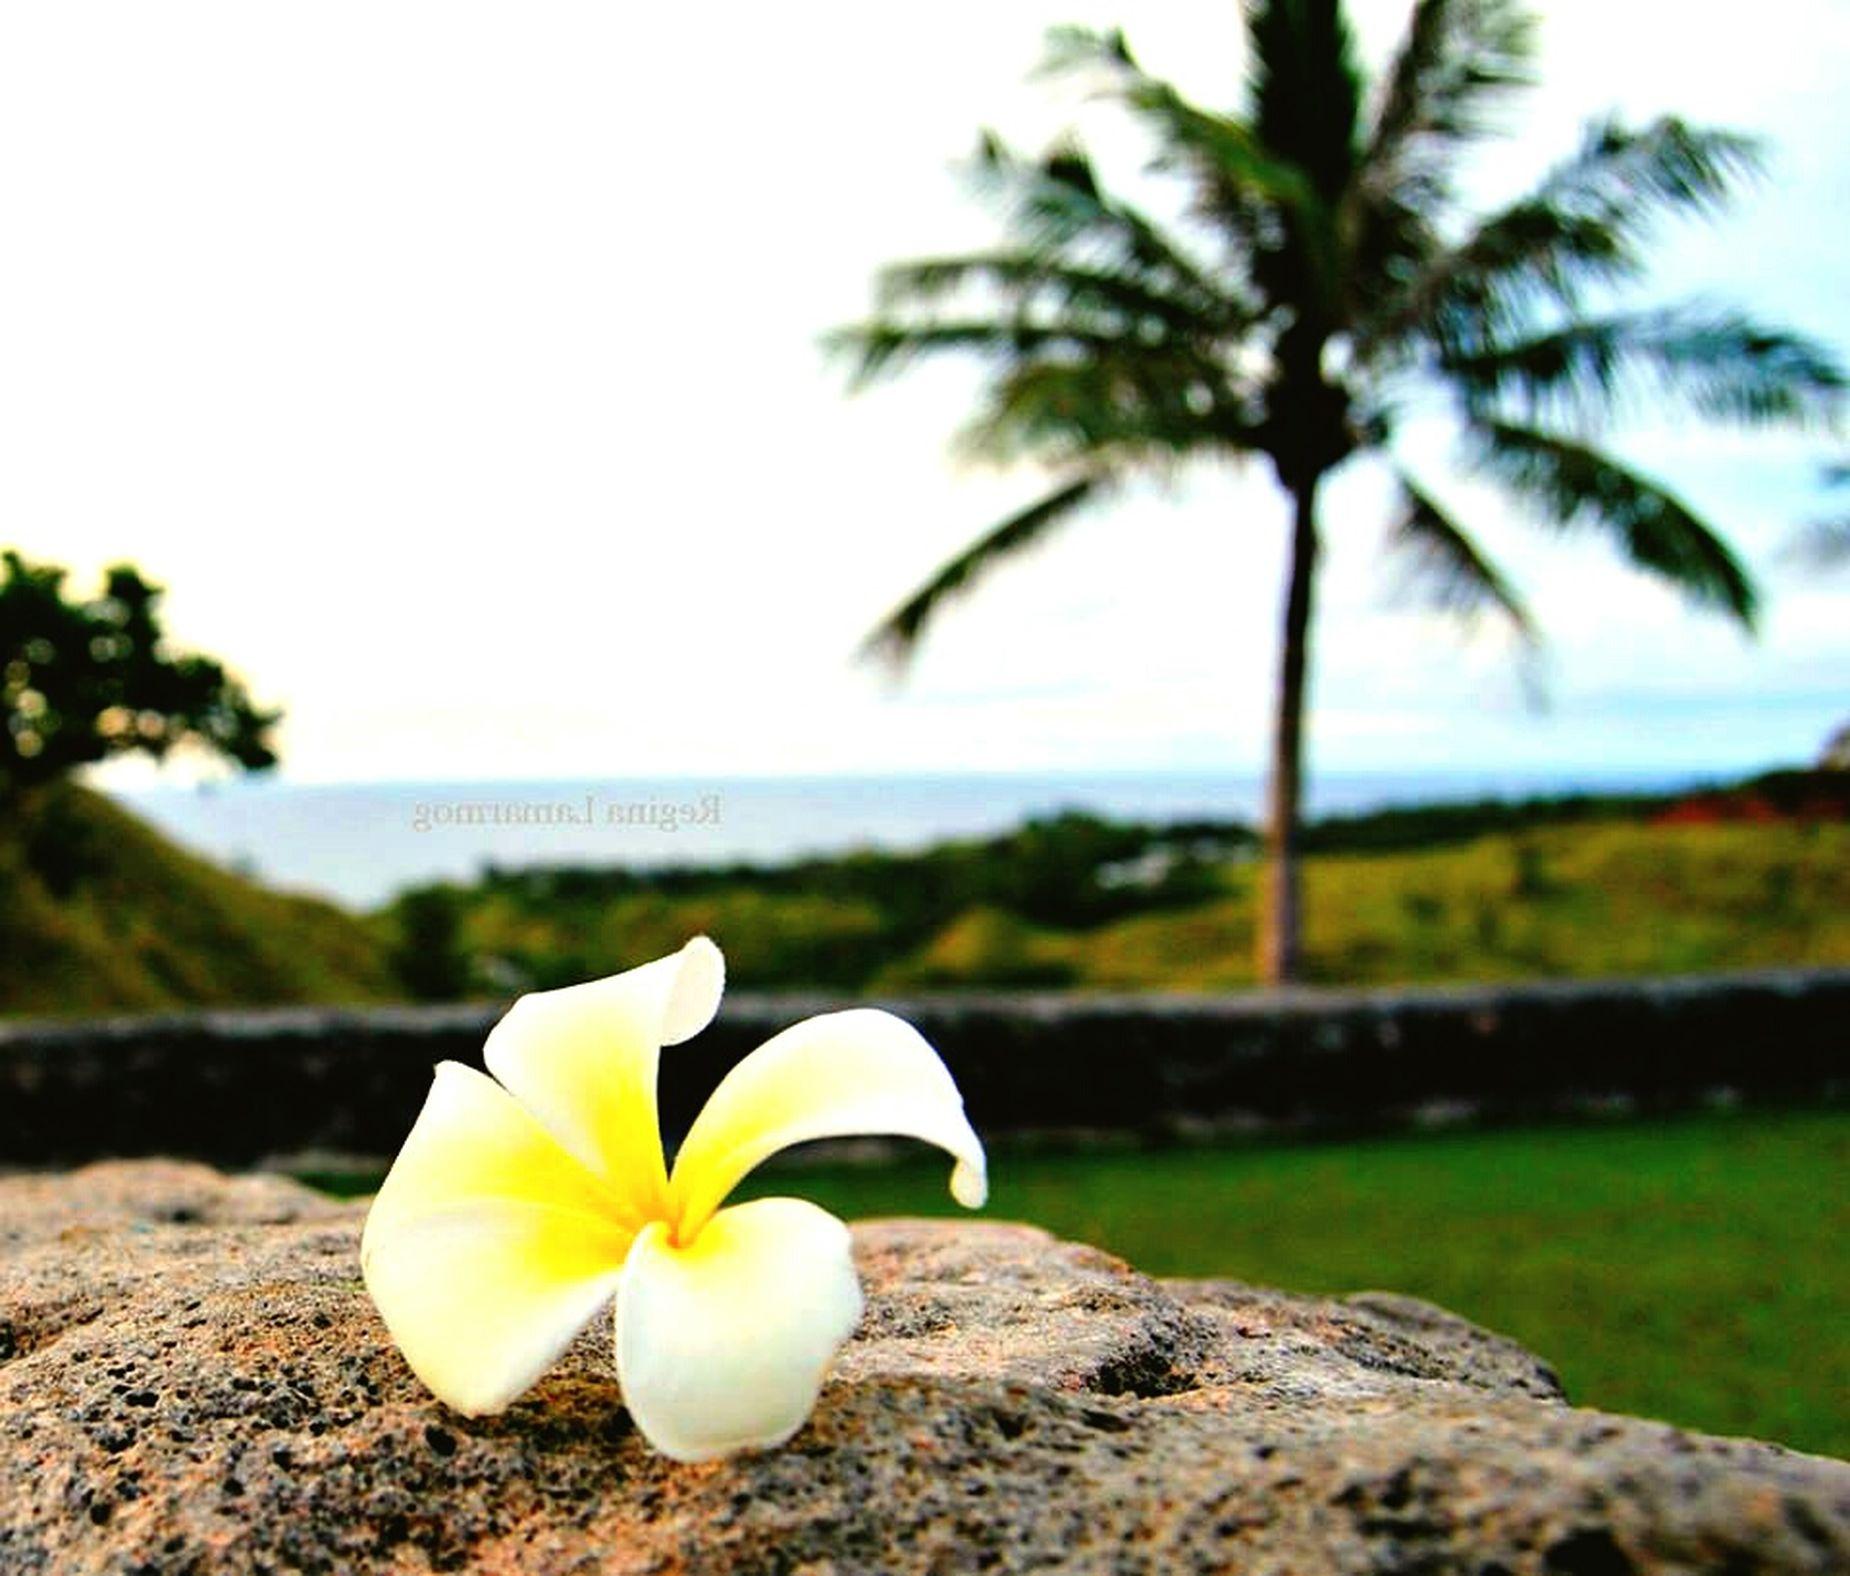 Island beauty Islandlife Isandliving Beautyofislandliving SouthBound Blessedeveryday Islandgirl Wheremyheartis